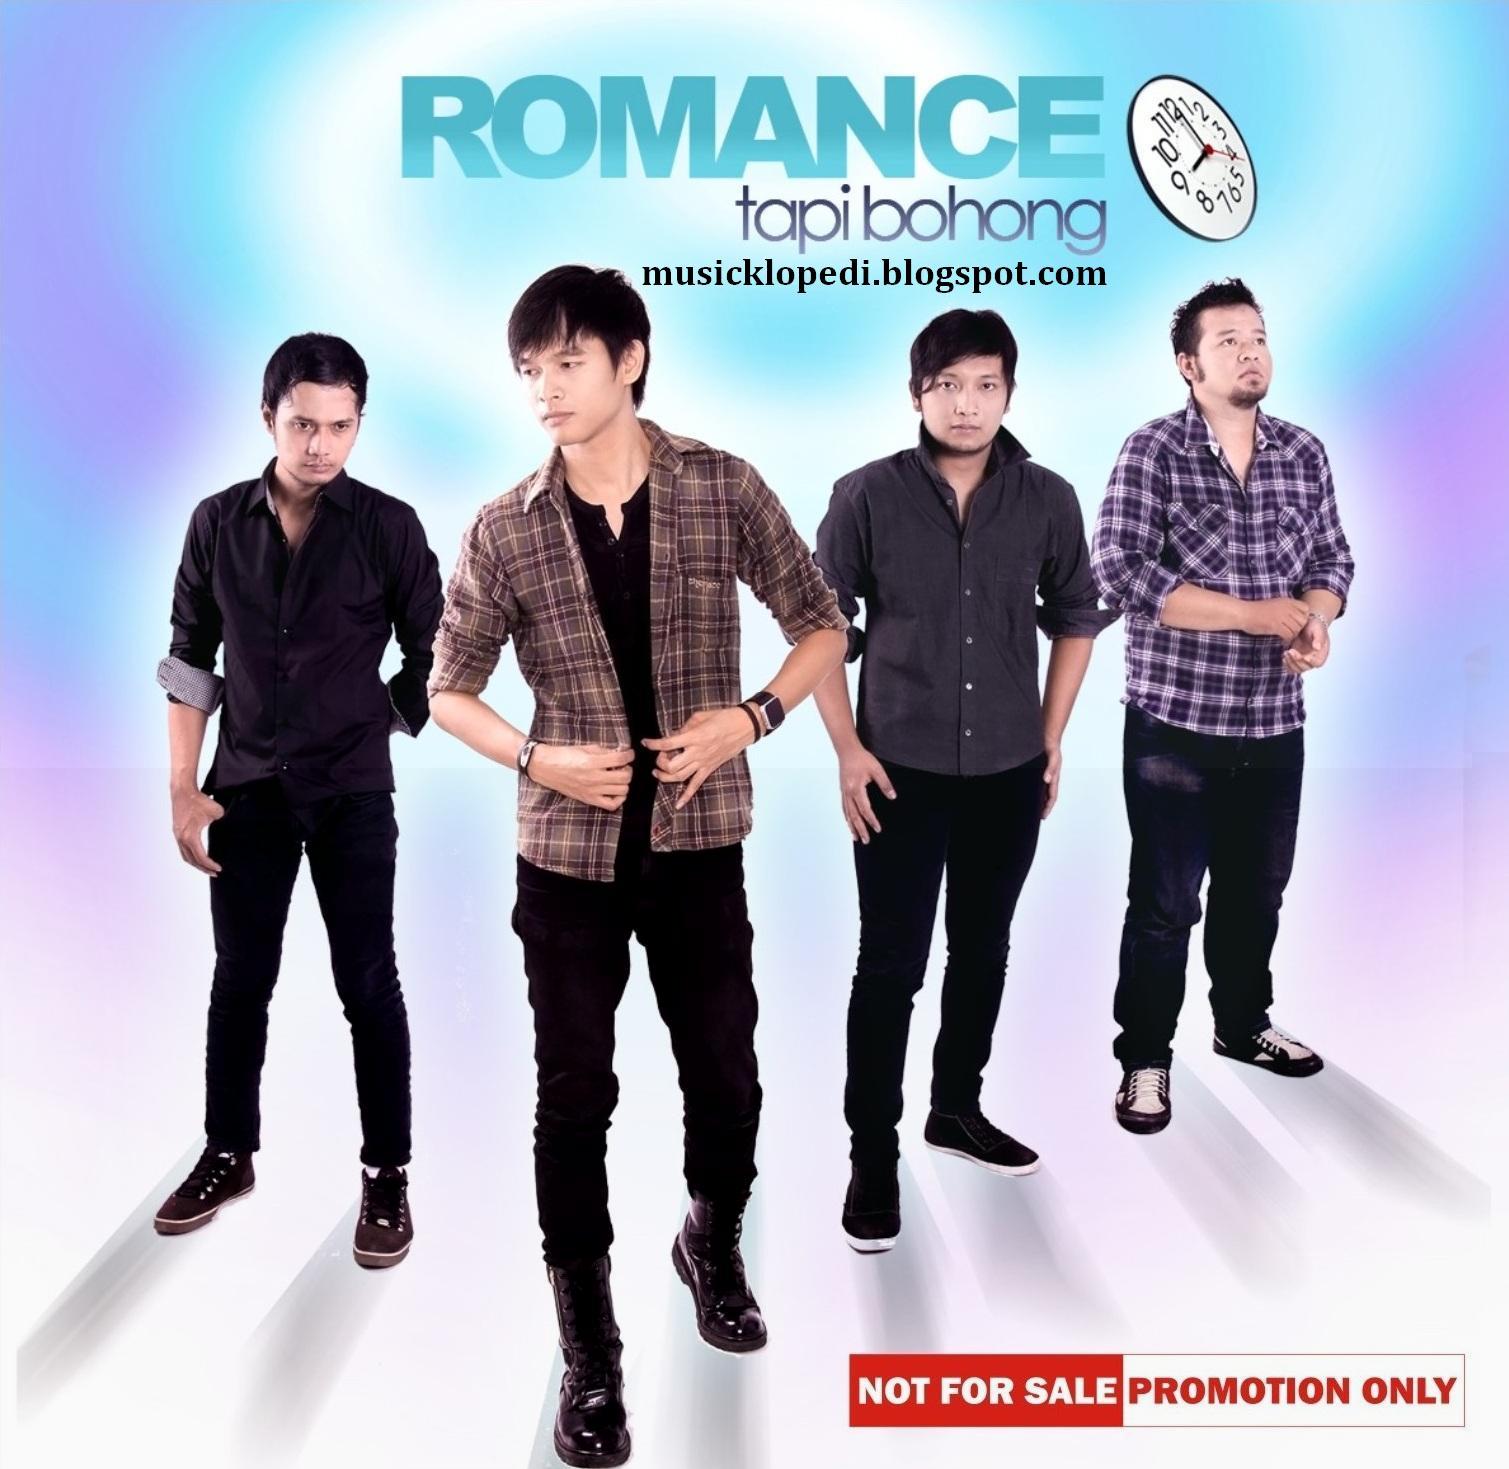 Lirik Lagu Romance - Tapi Bohong